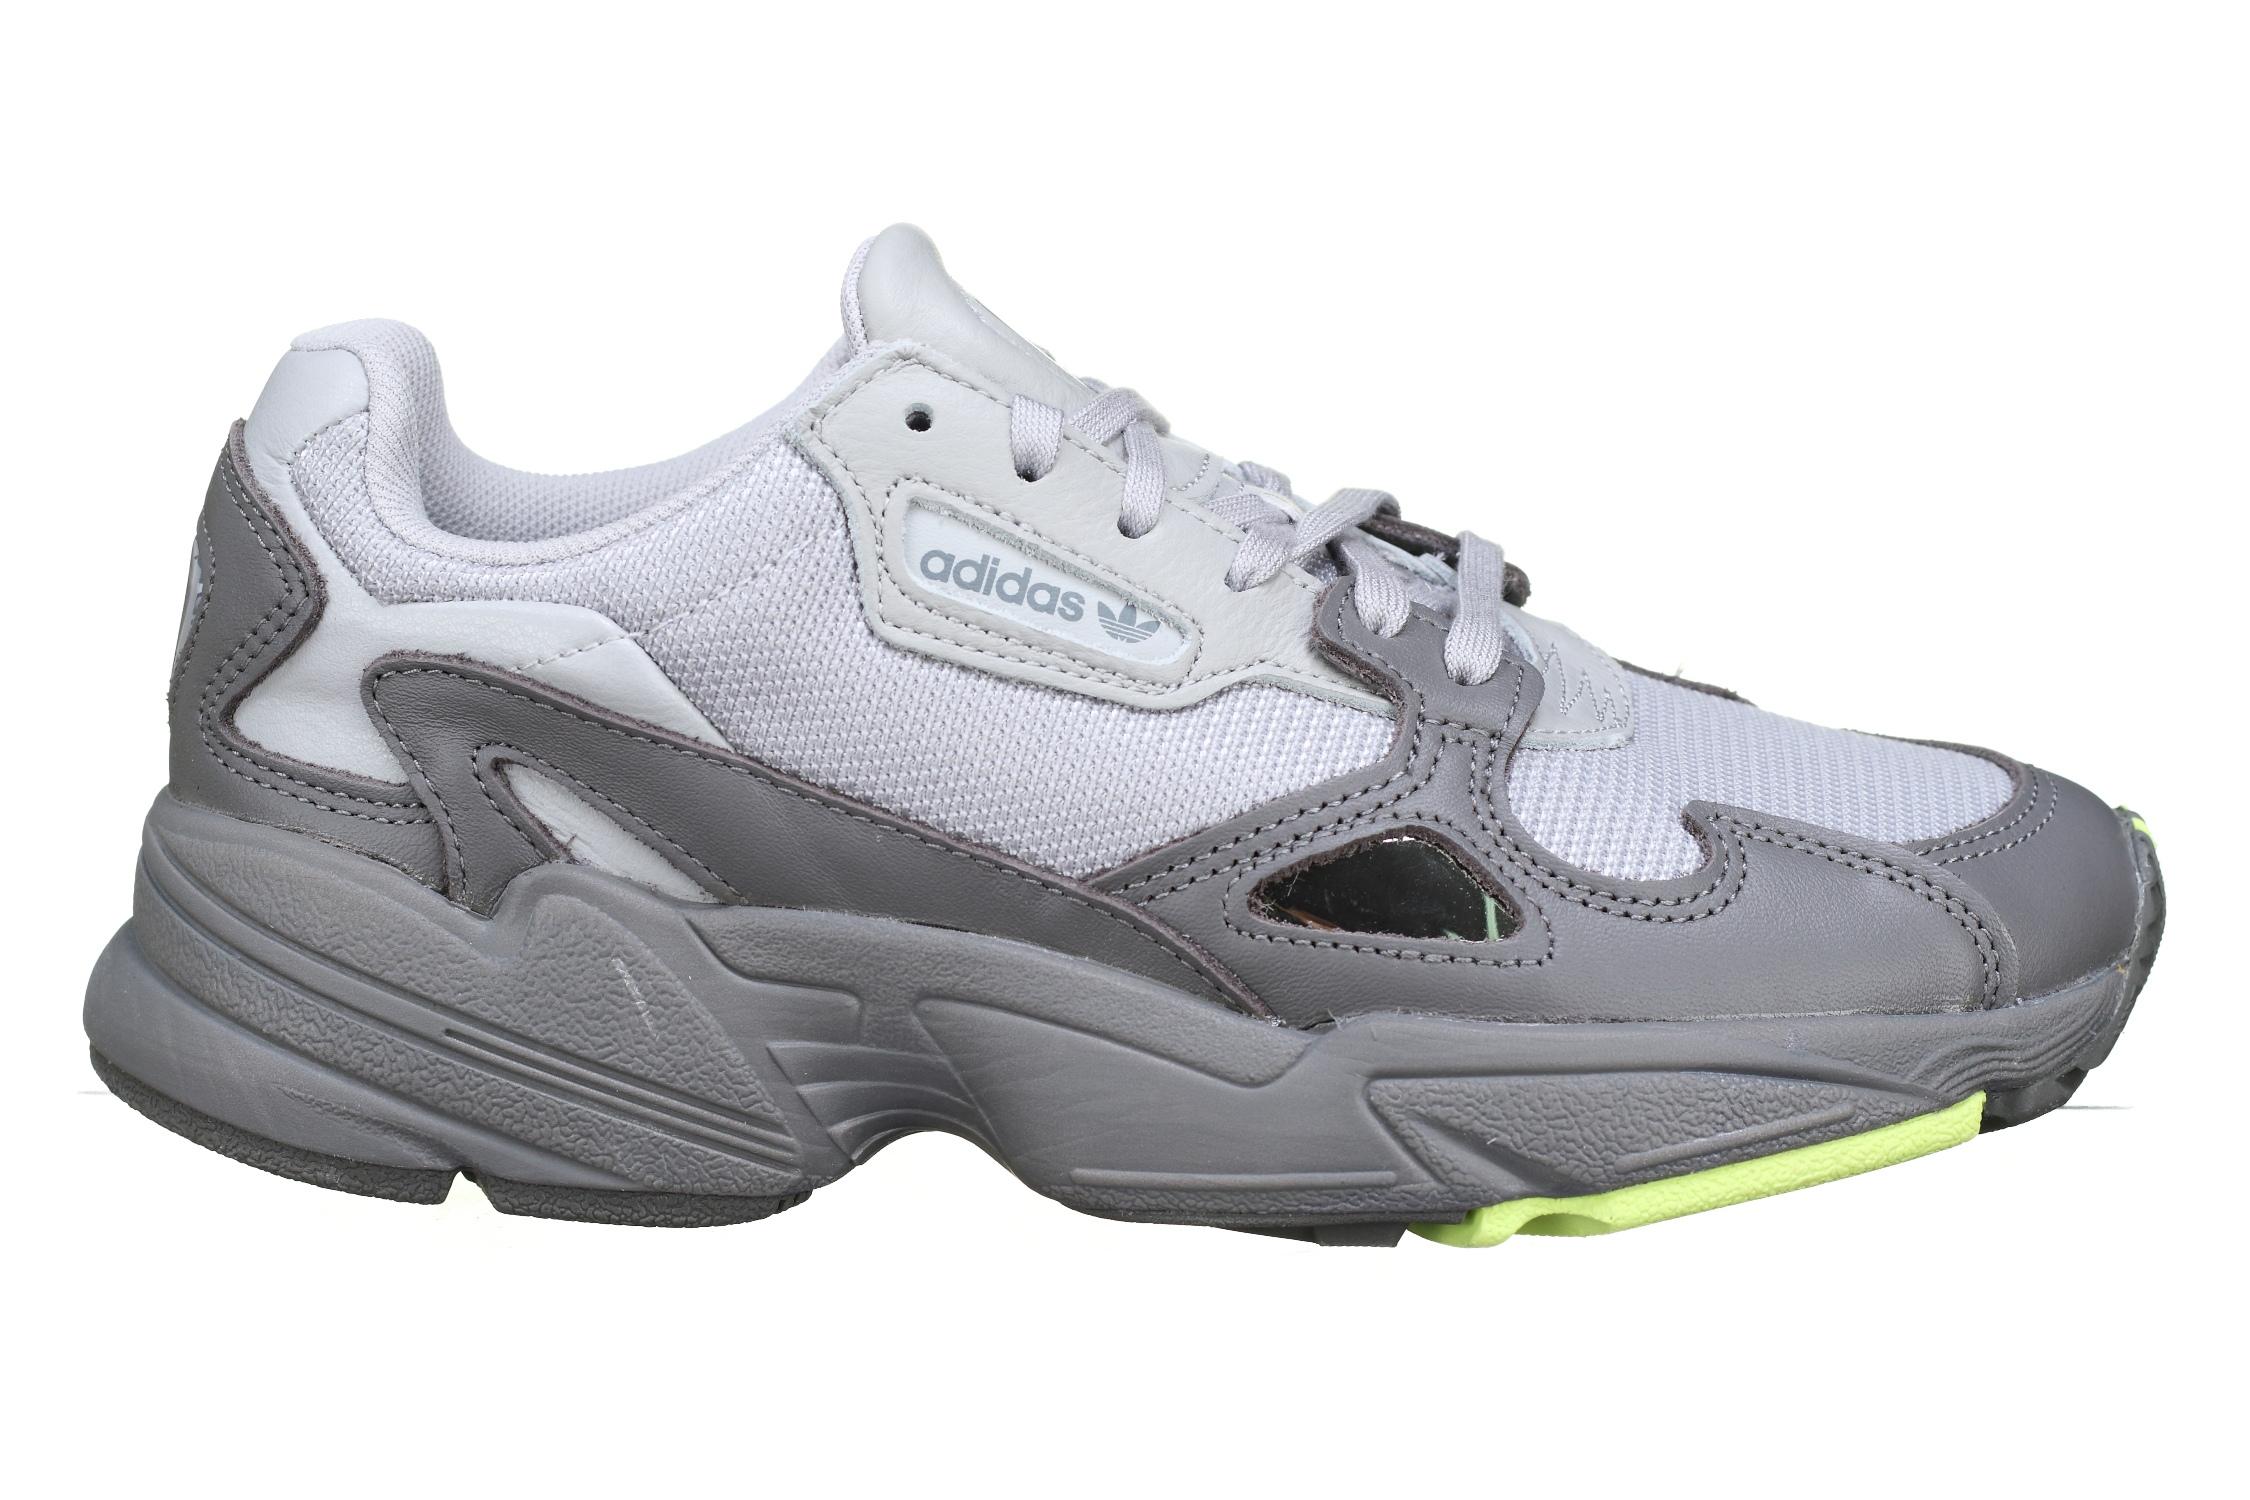 https://www.leadermode.com/180934/adidas-falcon-w-ee5115-gris.jpg